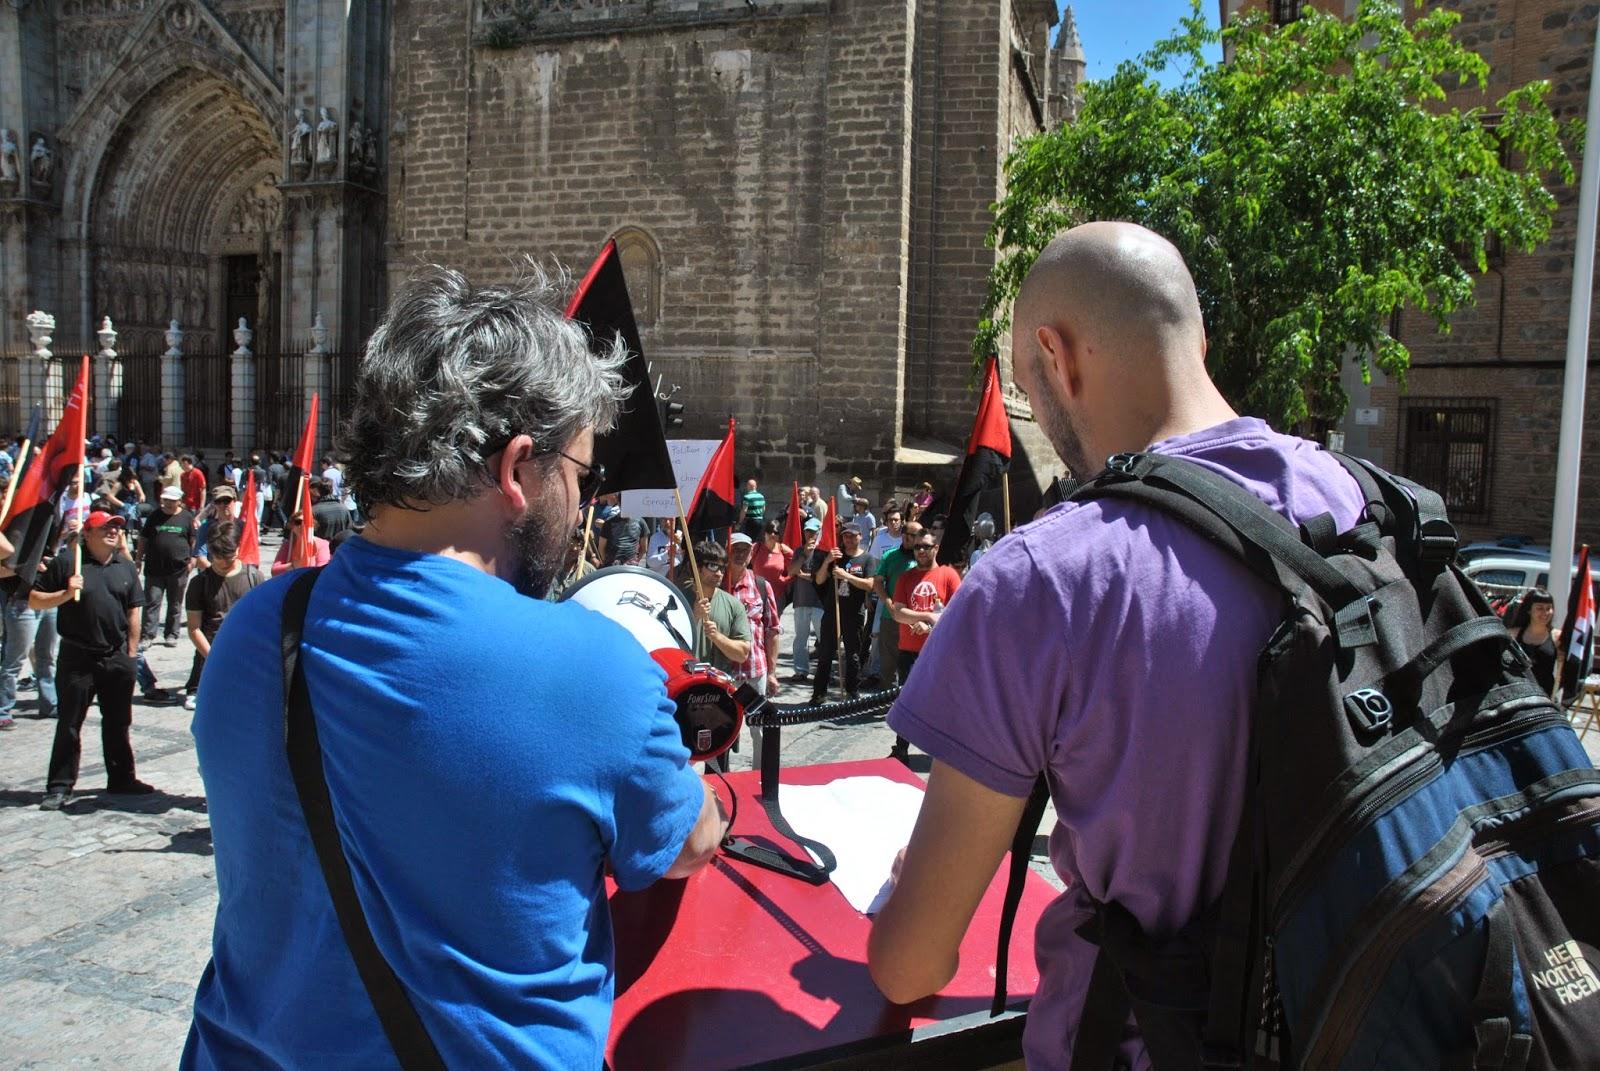 http://cntaittoledo.blogspot.com.es/2014/05/la-cnt-toledana-volvio-marchar-por-las.html